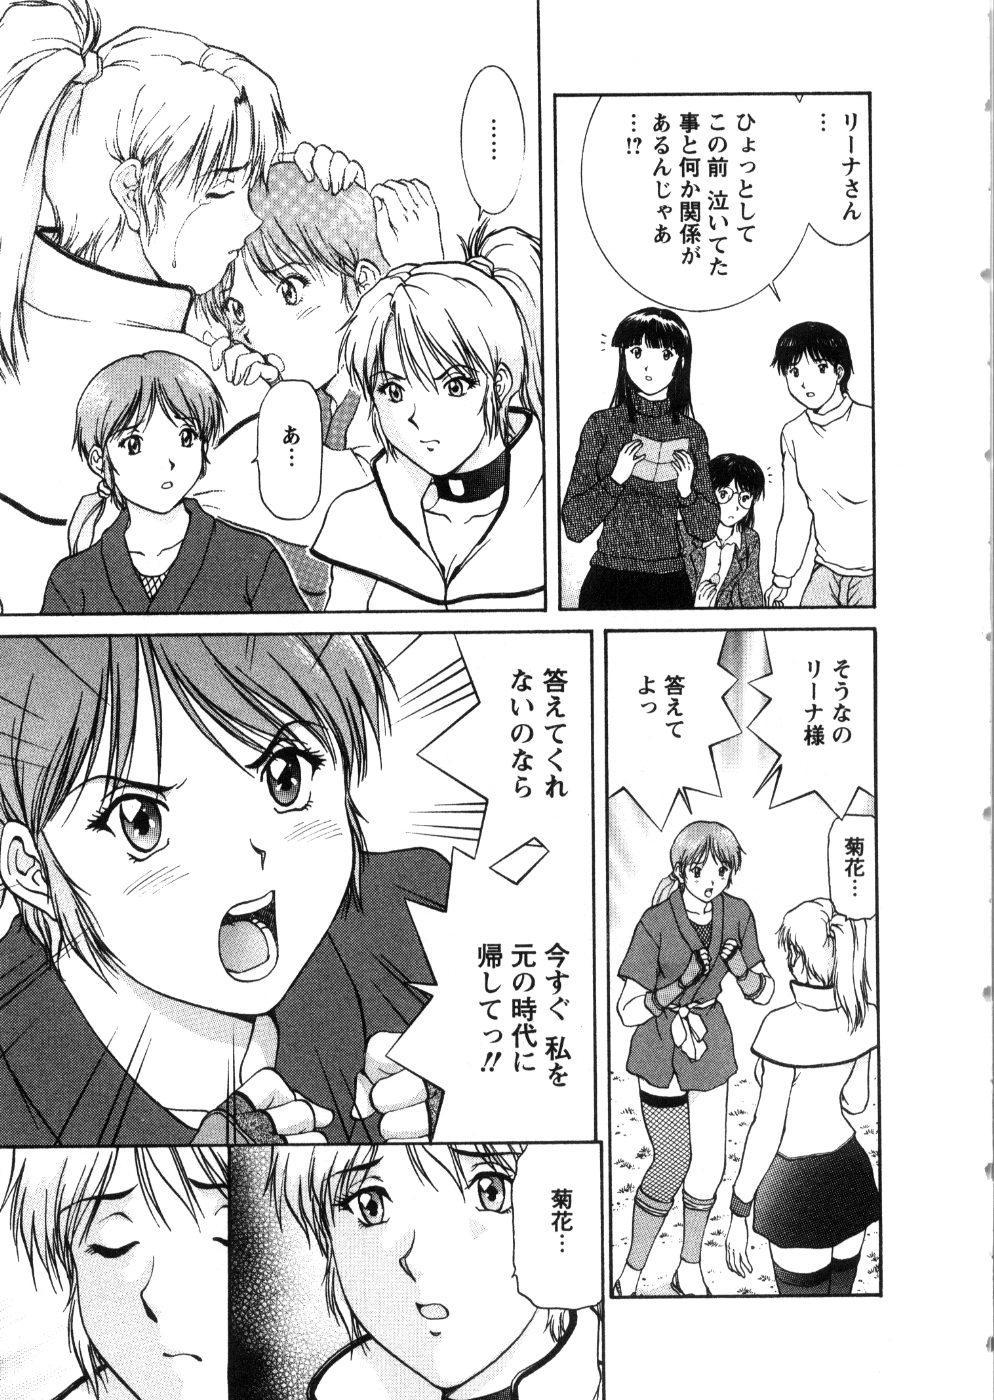 Oneechan-tachi ga Yatte Kuru 03 14